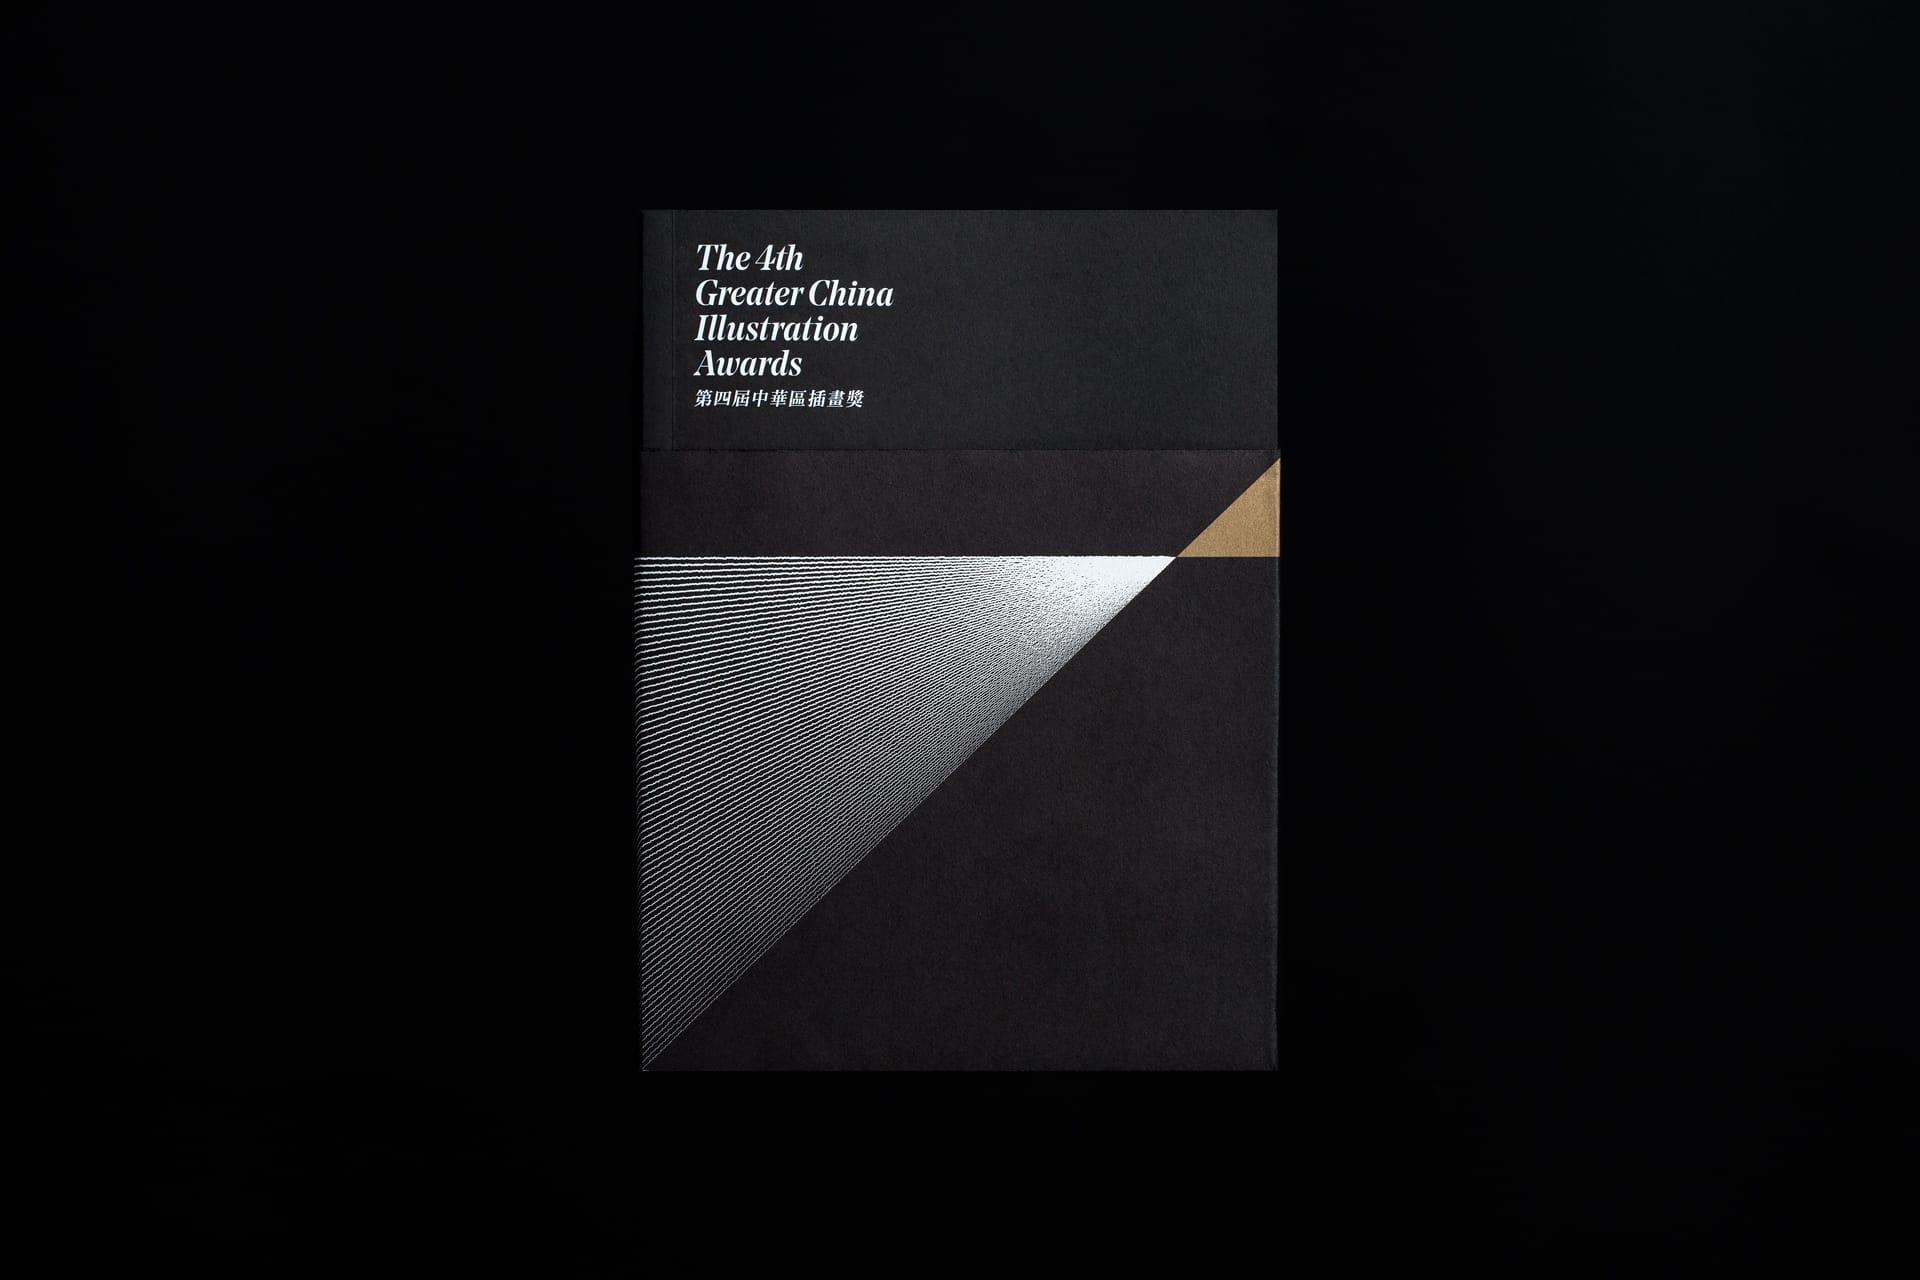 4th-greater-china-illustration-awards_02